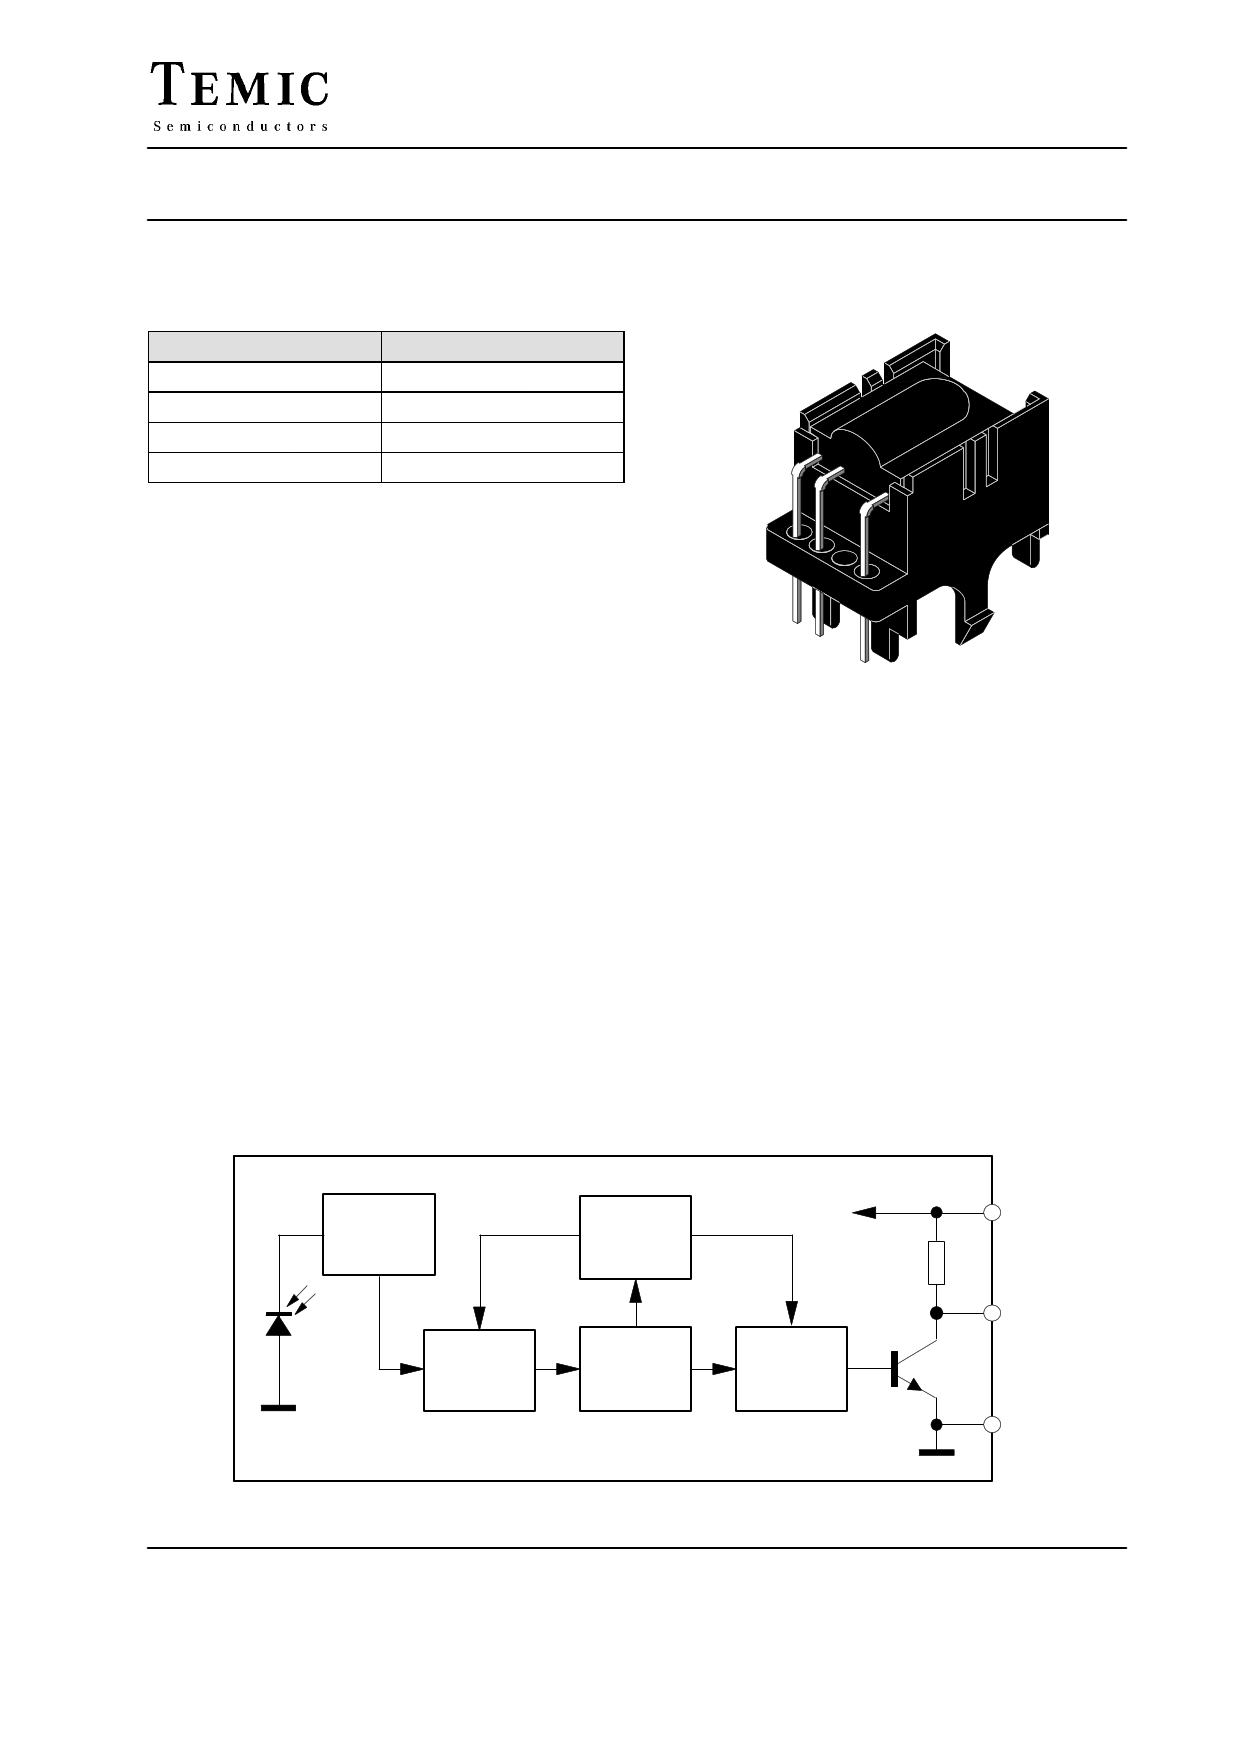 TFMT5400 데이터시트 및 TFMT5400 PDF